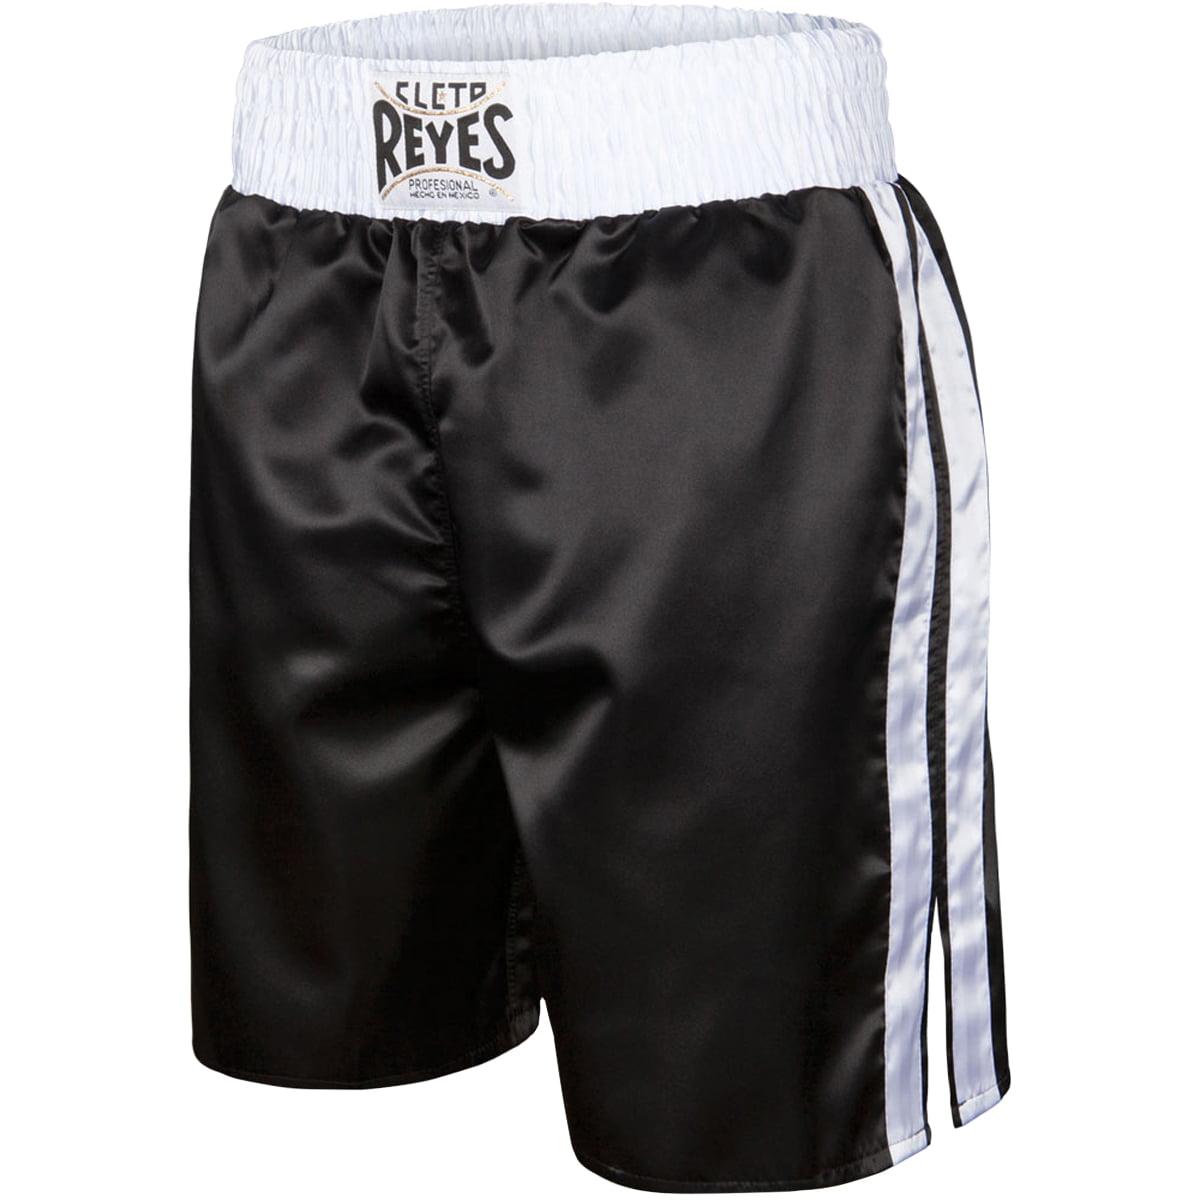 "Cleto Reyes Satin Classic Boxing Trunks - Medium (36"") - Black/White"